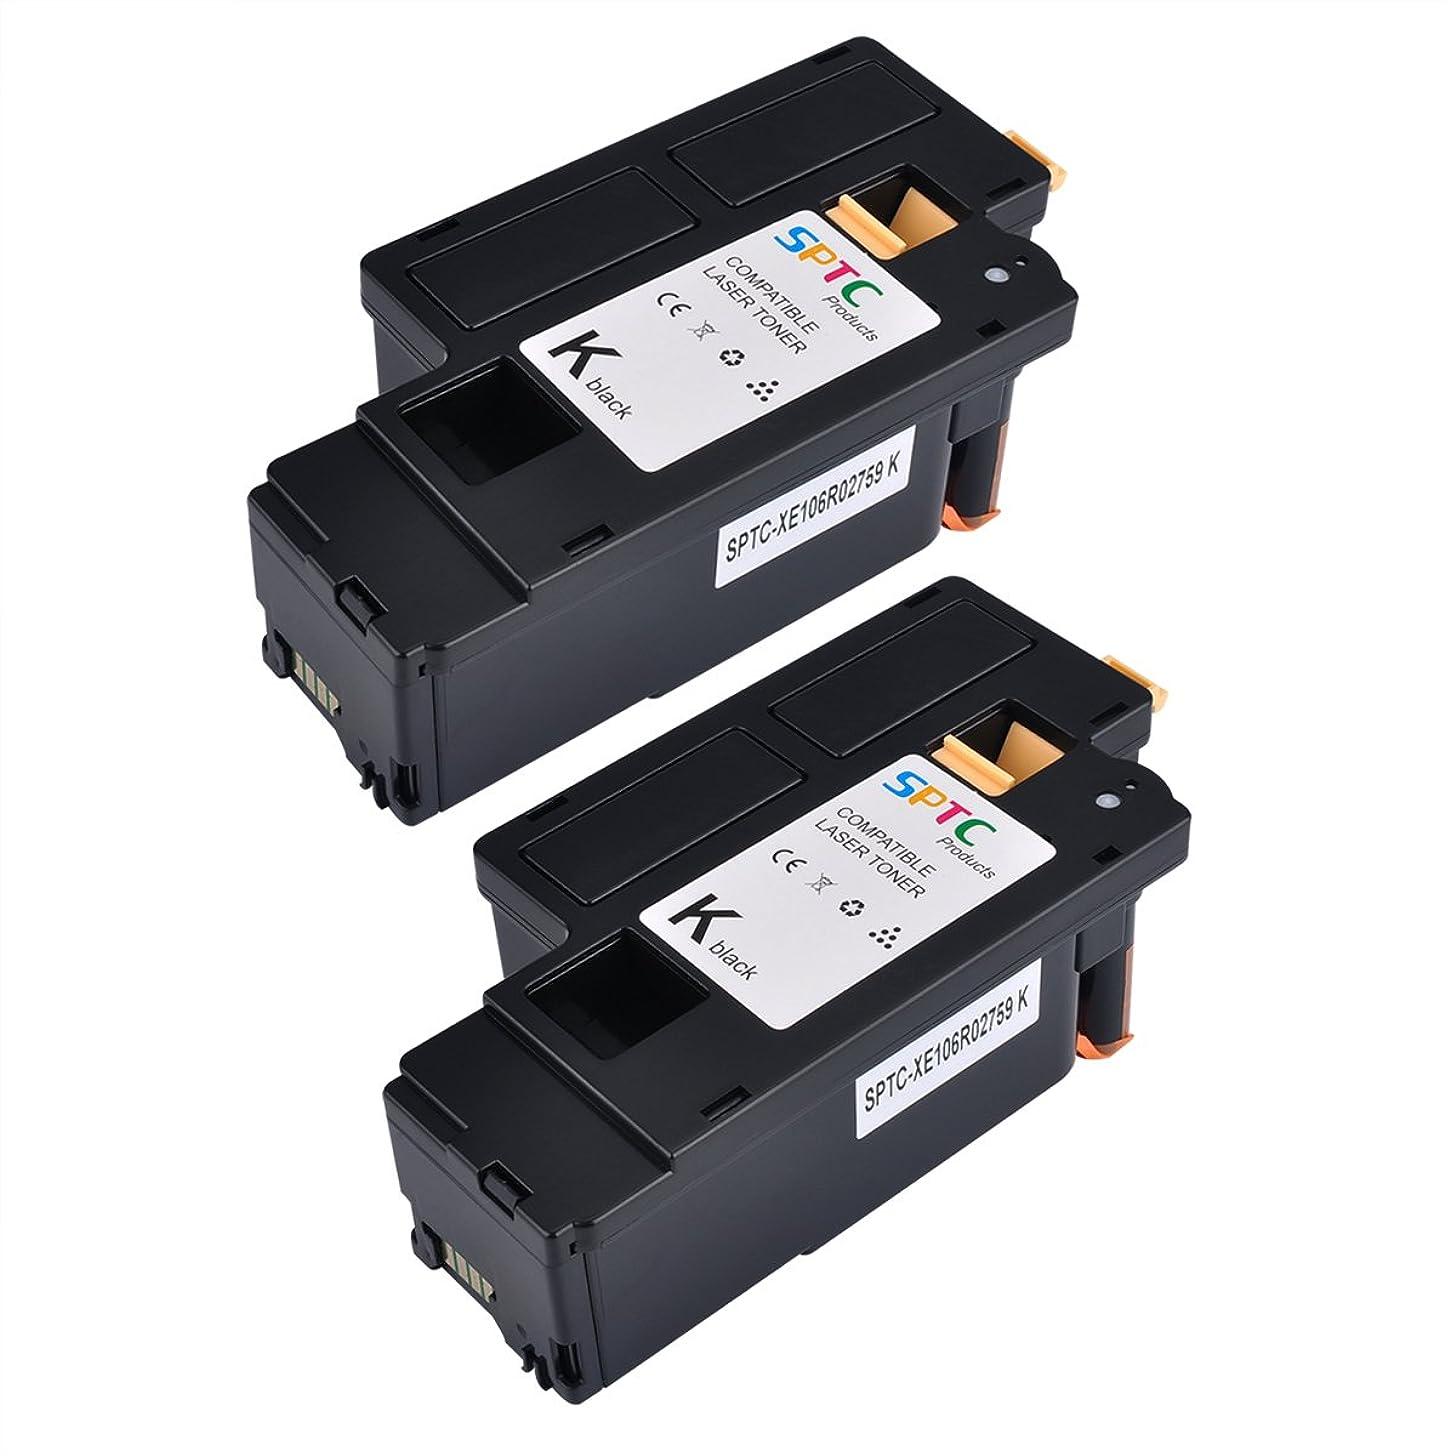 SPTC High Yield Compatible Phaser 6020 6022 6022/NI WorkCentre 6025 6027 6028 Toner cartridges 2 Pack Set 106R02759 Black